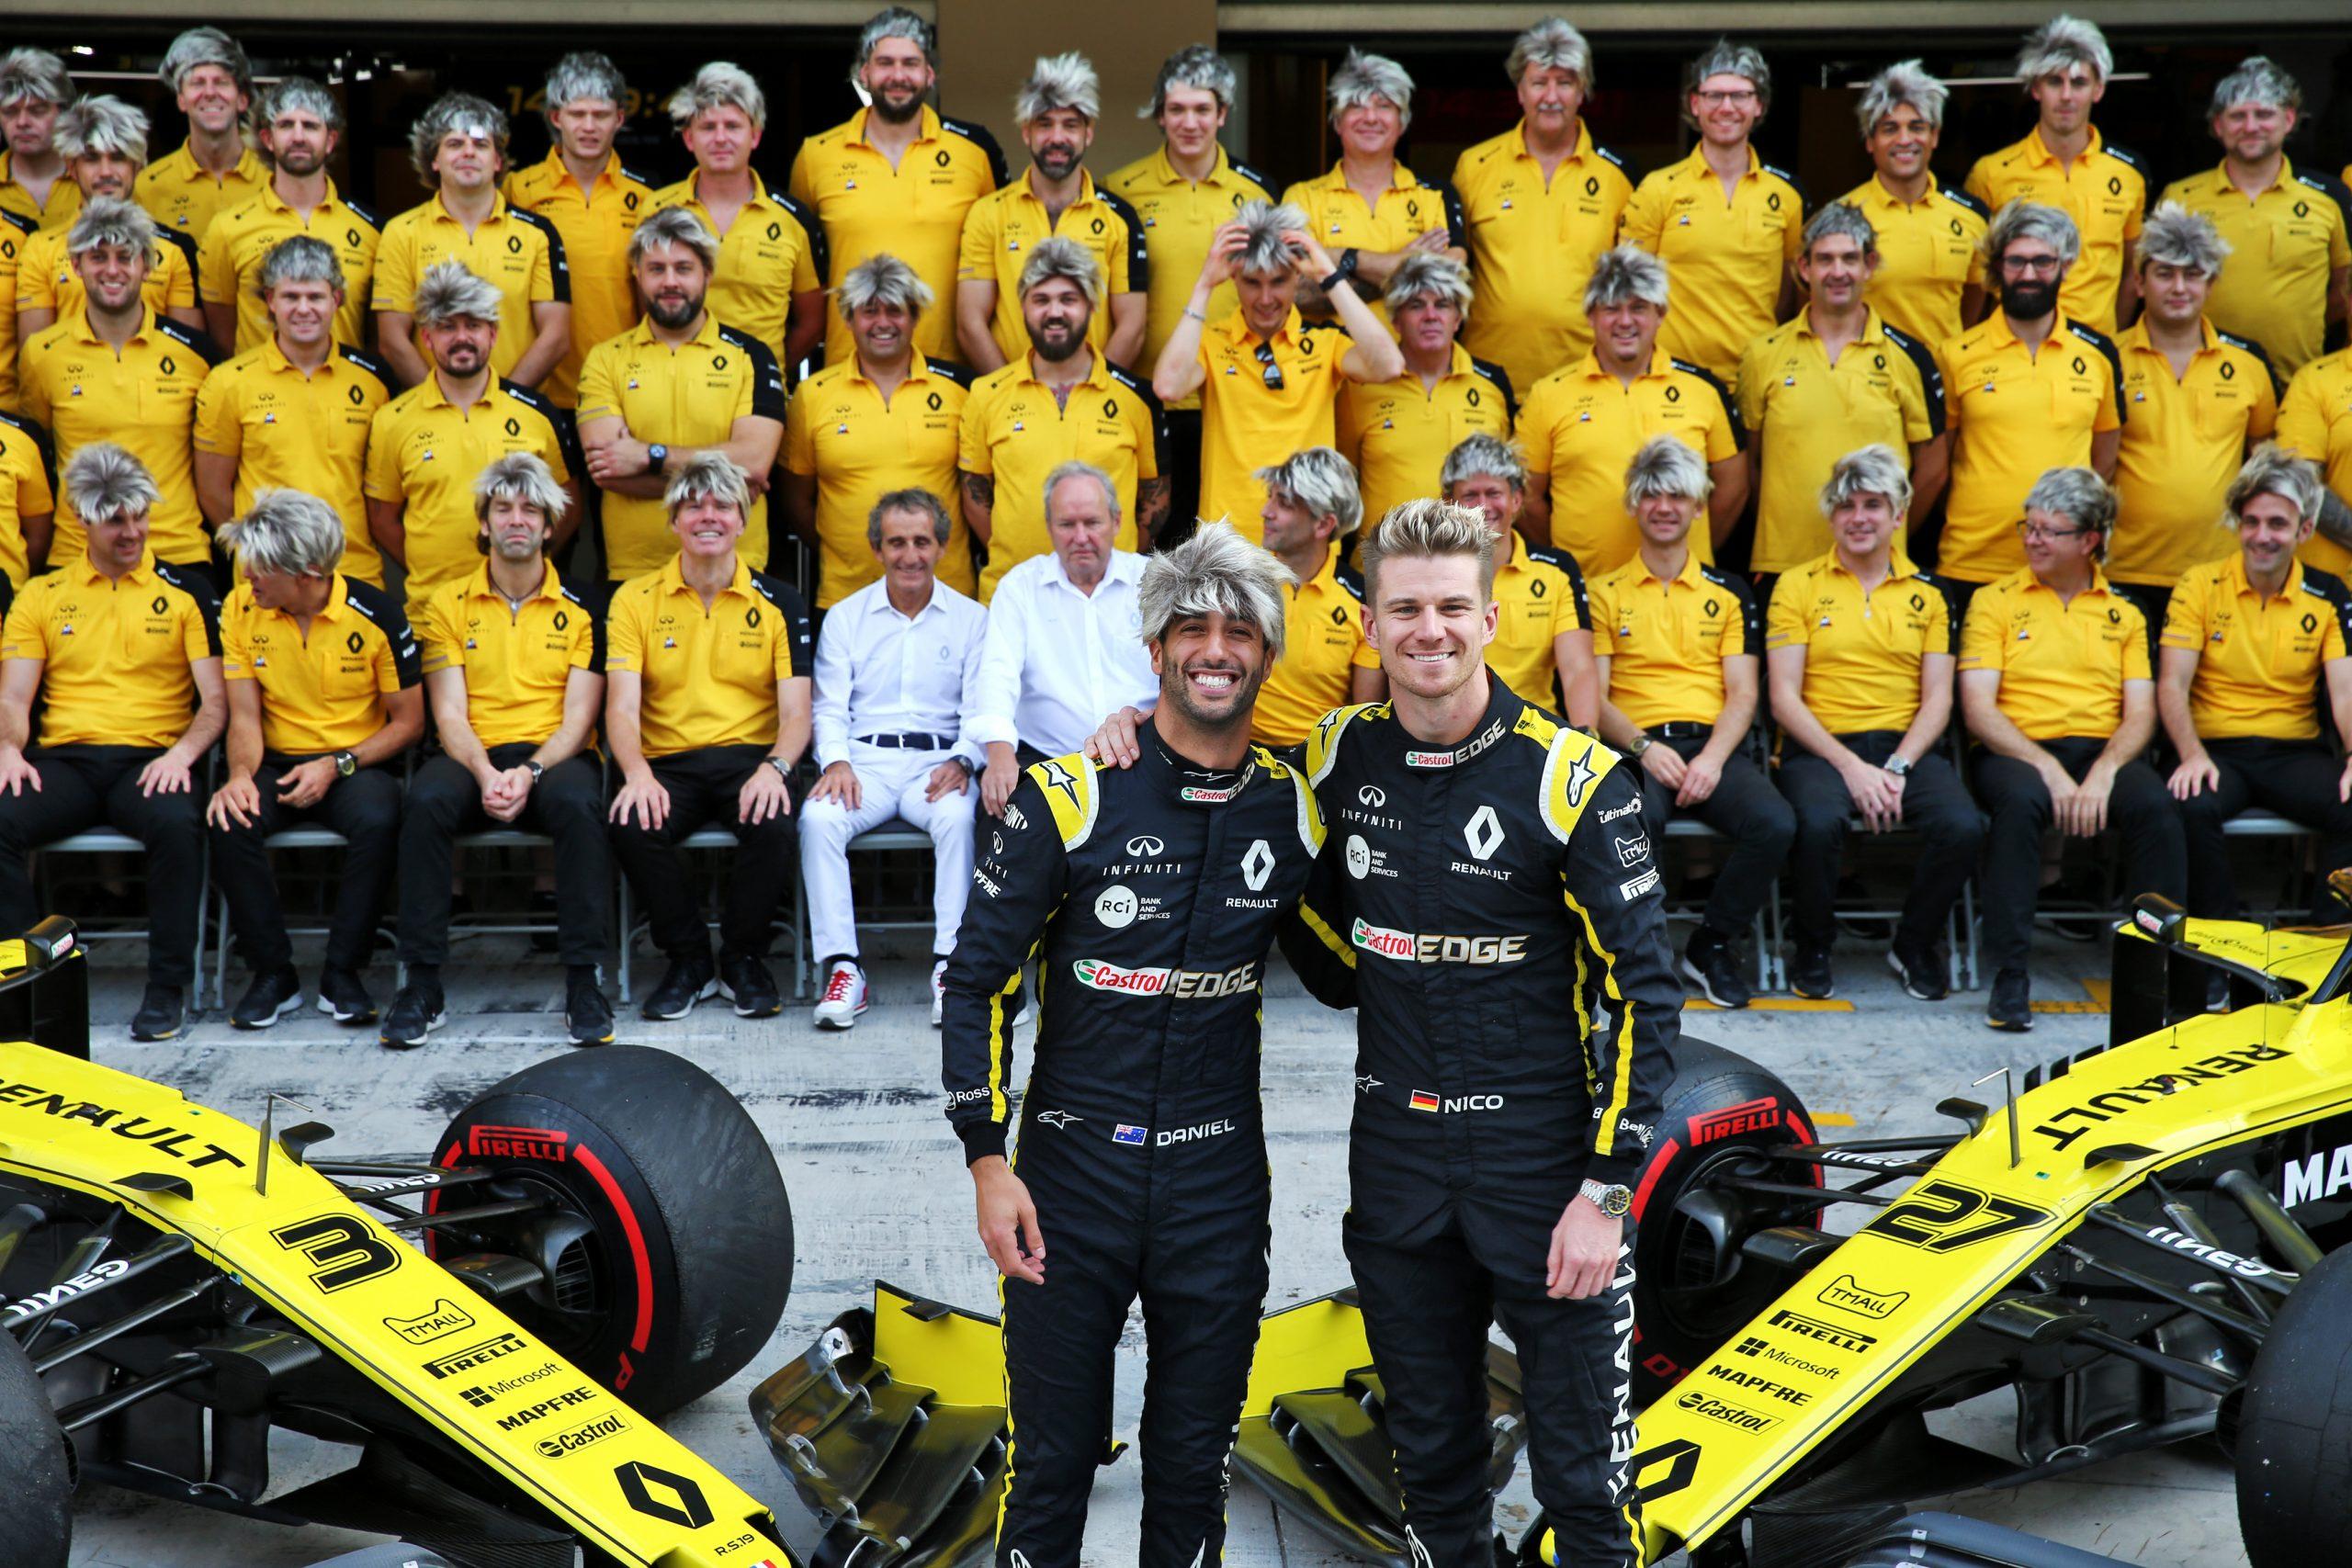 F1 Renault F1 grand prix d'abou dhabi